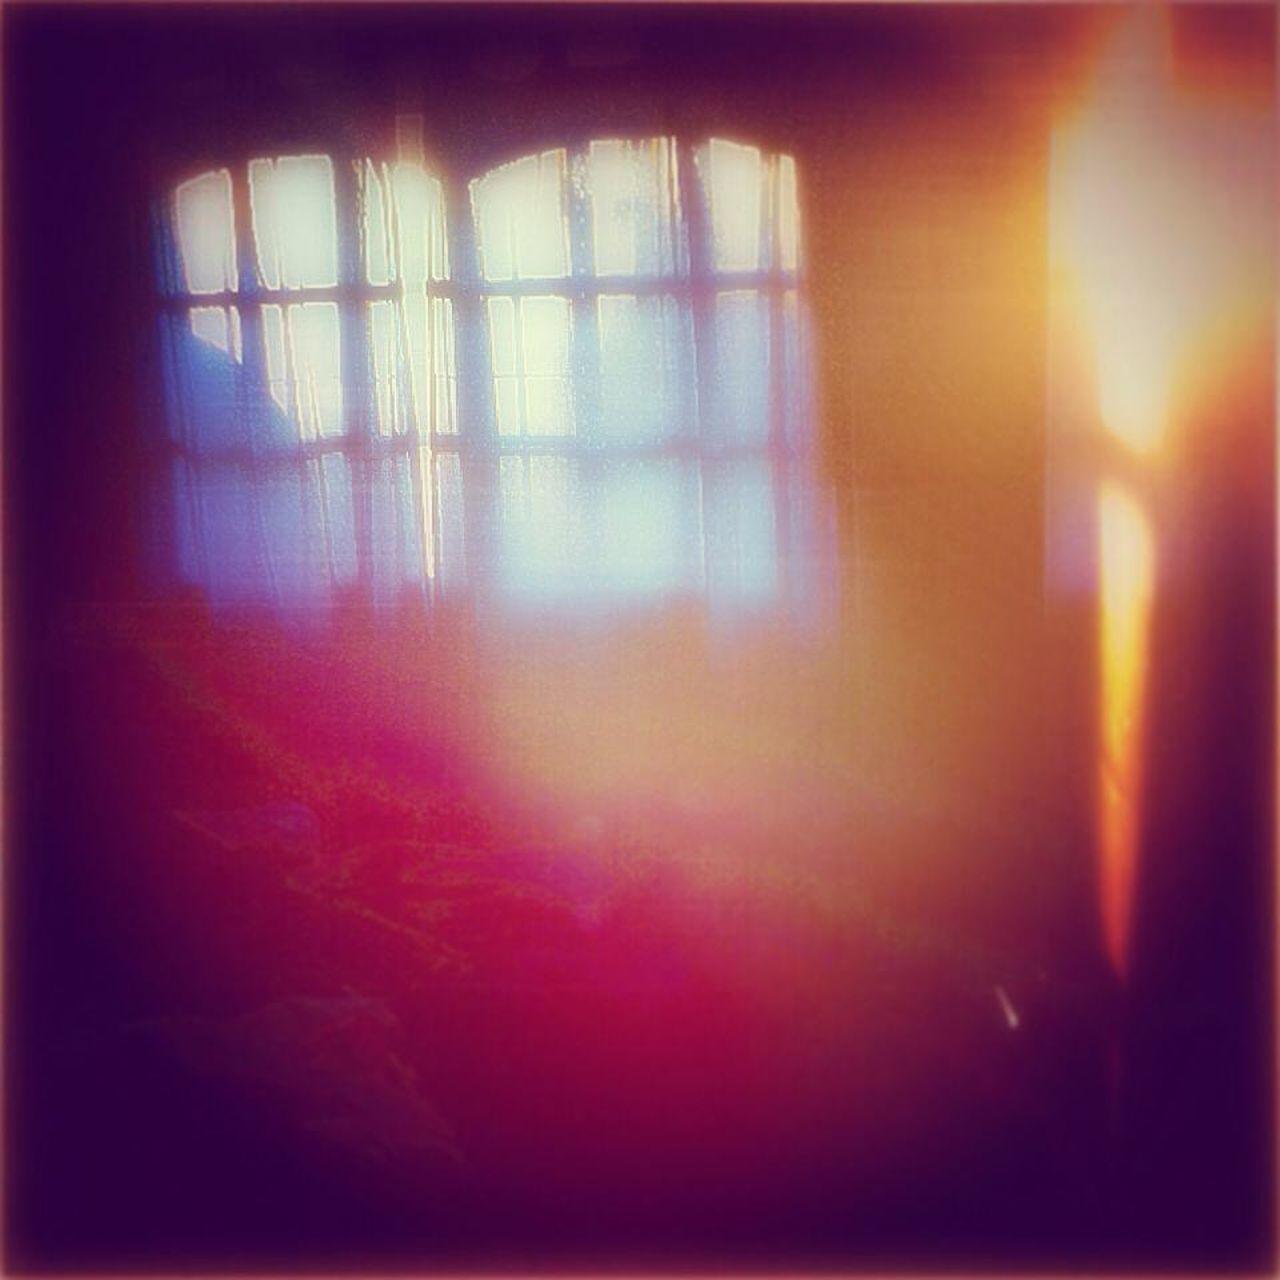 GLASS WINDOW AGAINST BRIGHT SUN